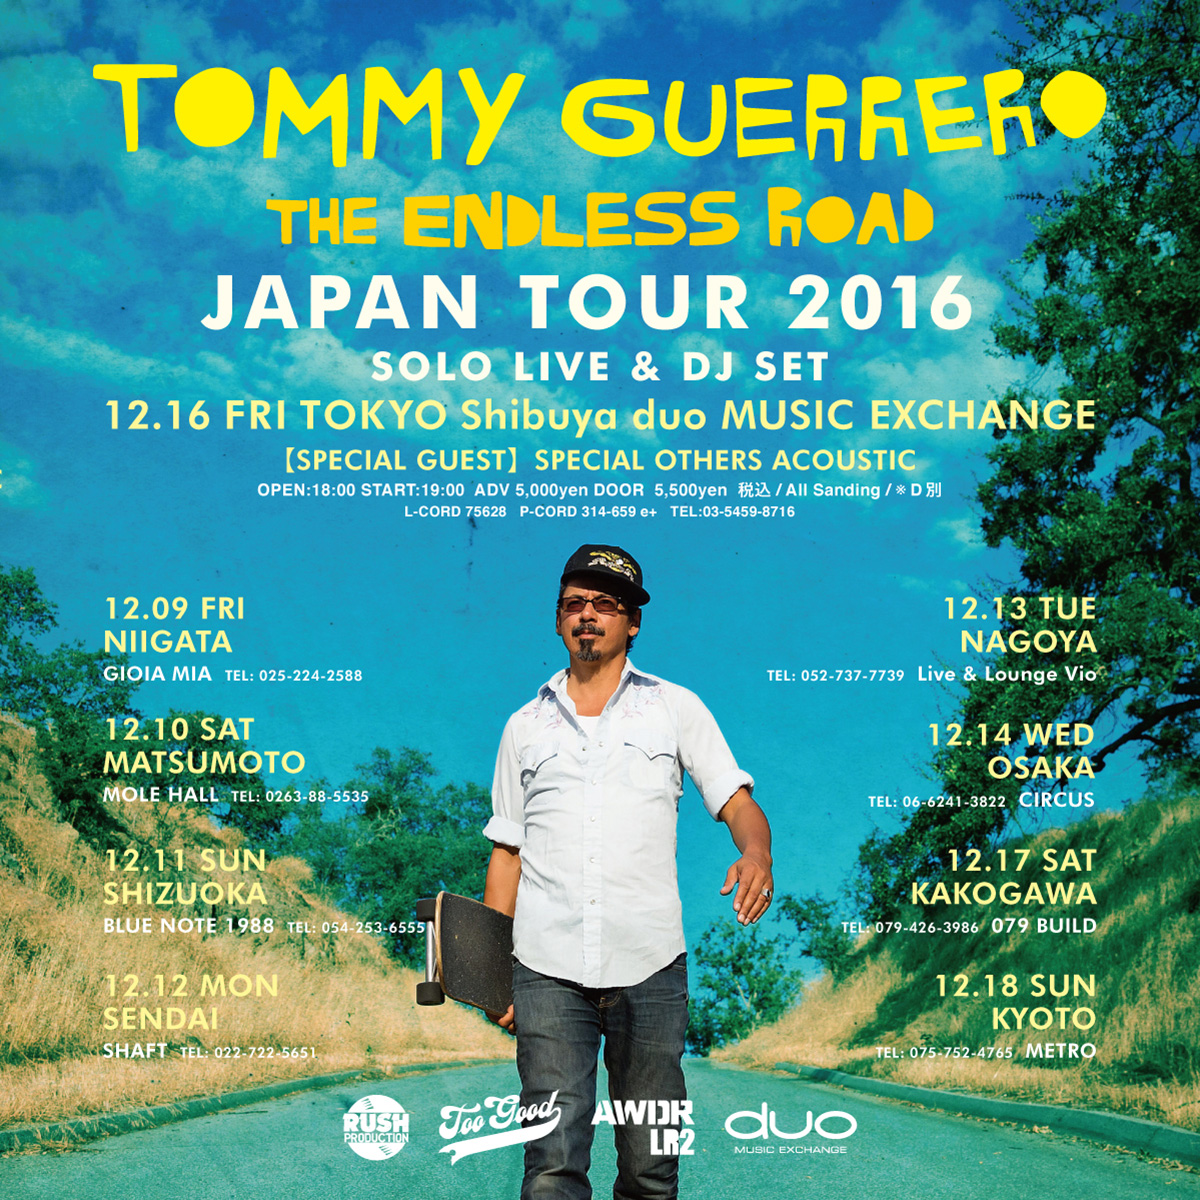 tg_jp_tour-2016_flyer_insta